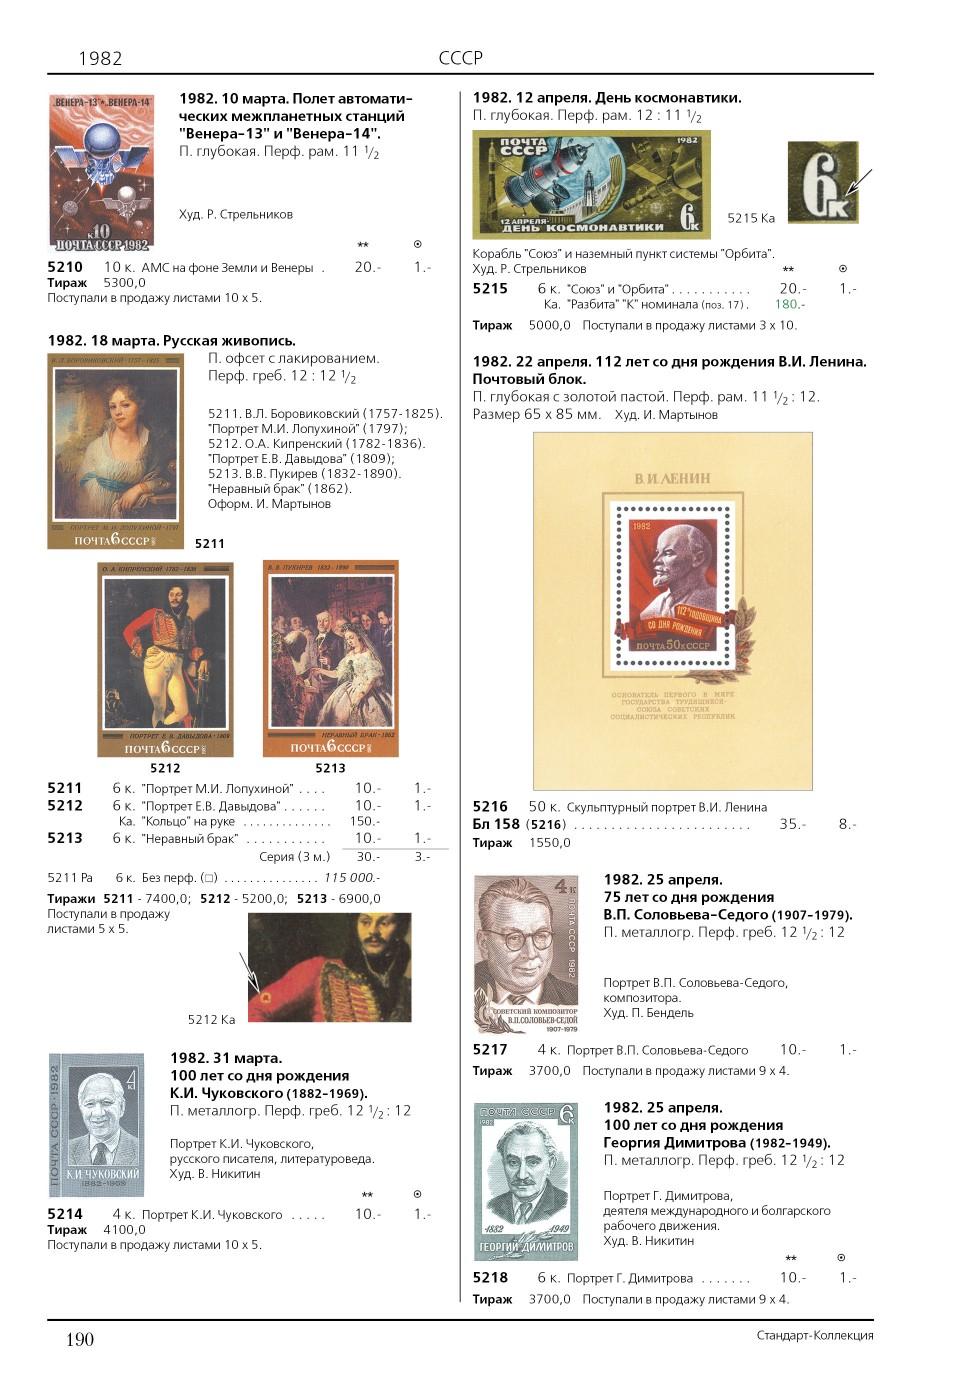 Каталог марок СССР Стандарт-Коллекция Загорский